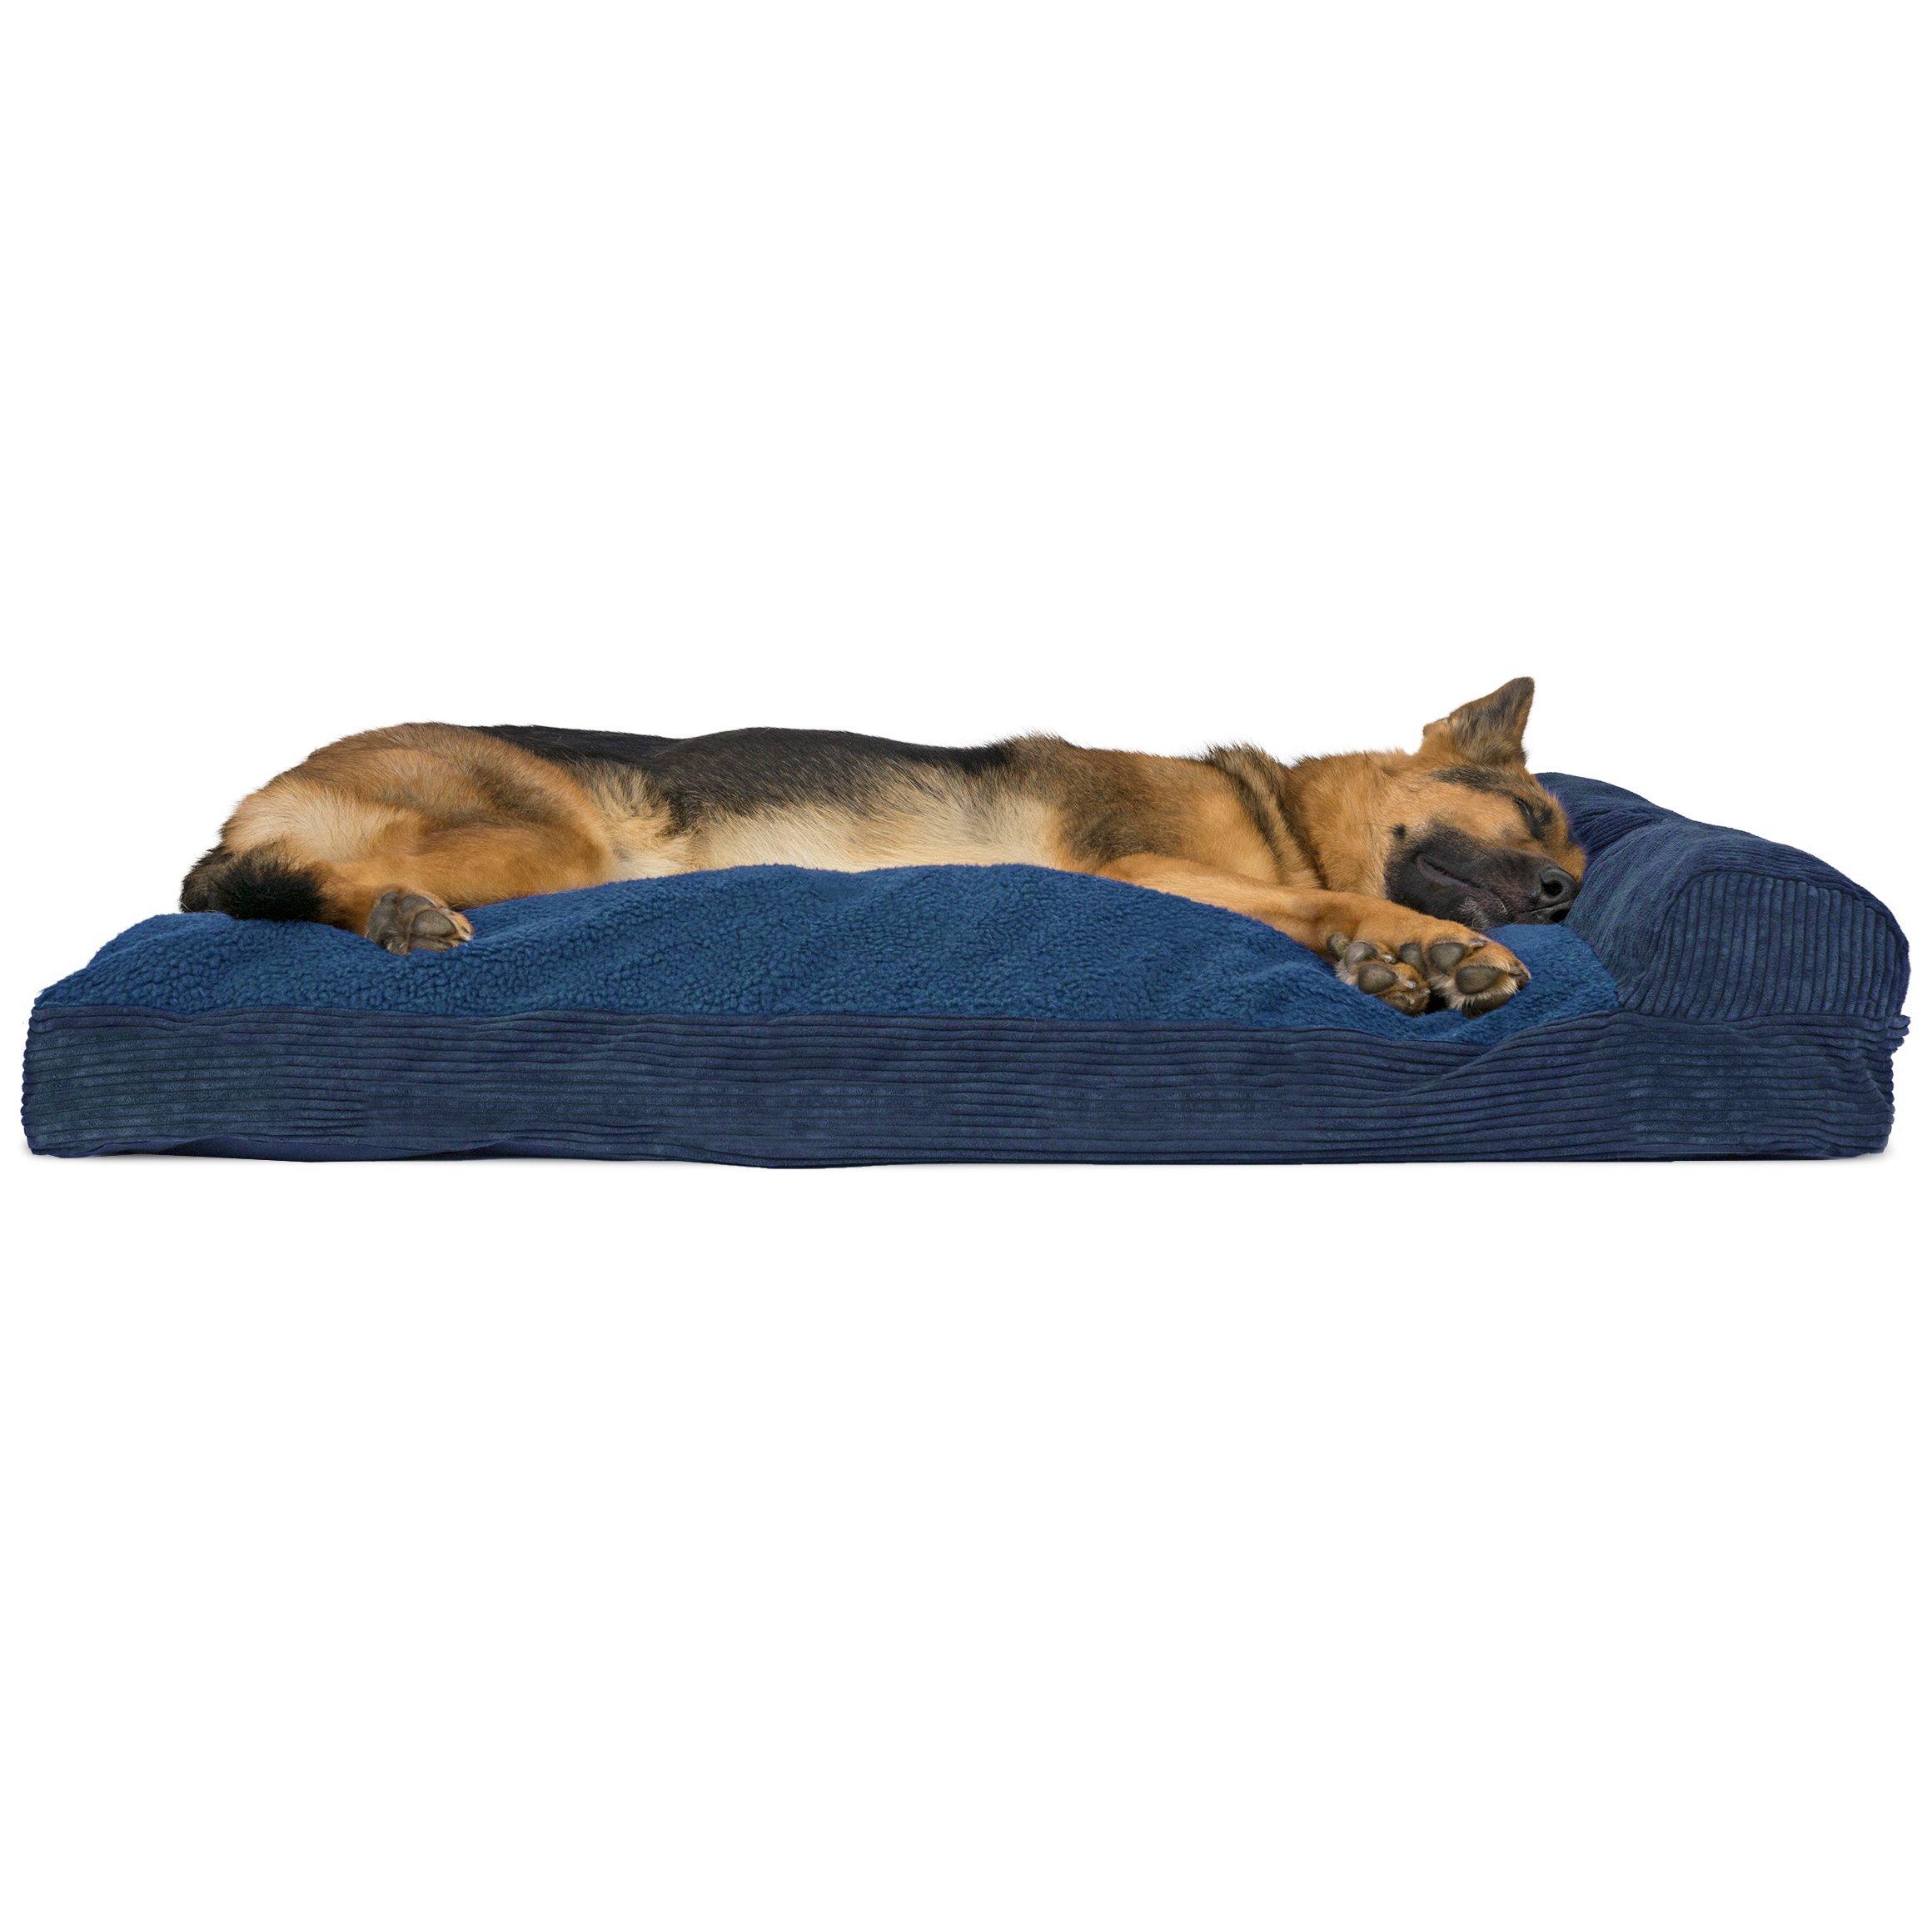 FurHaven Faux Fleece & Corduroy Chaise Lounge Pillow Sofa-Style Pet Bed, Jumbo, Navy Blue